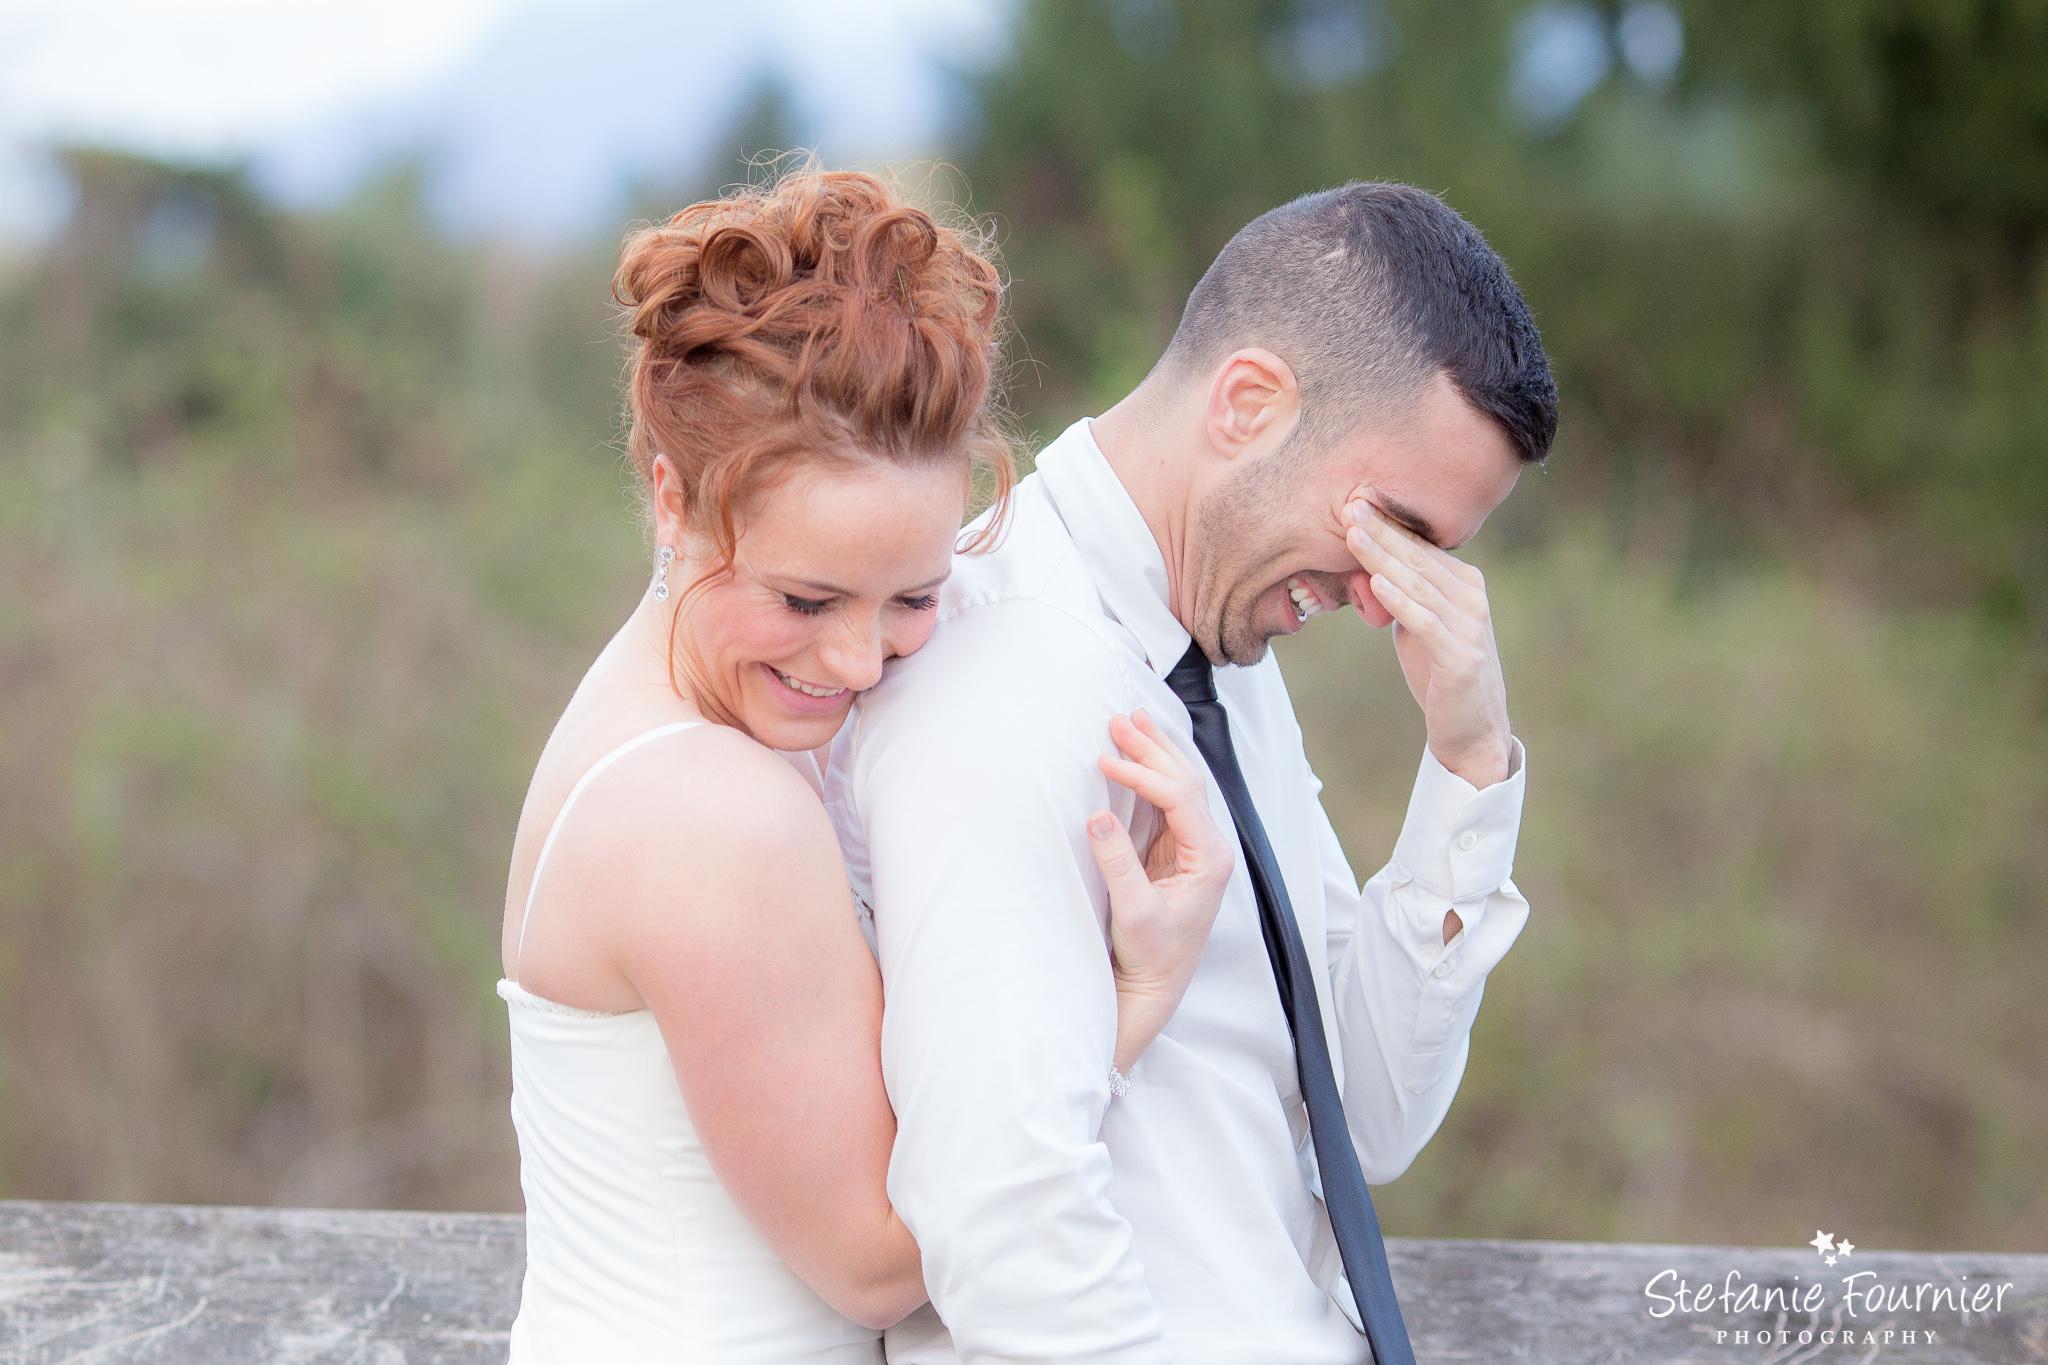 Stephanie Amp Fekret Langley Wedding Photographer Stefanie Fournier Photography